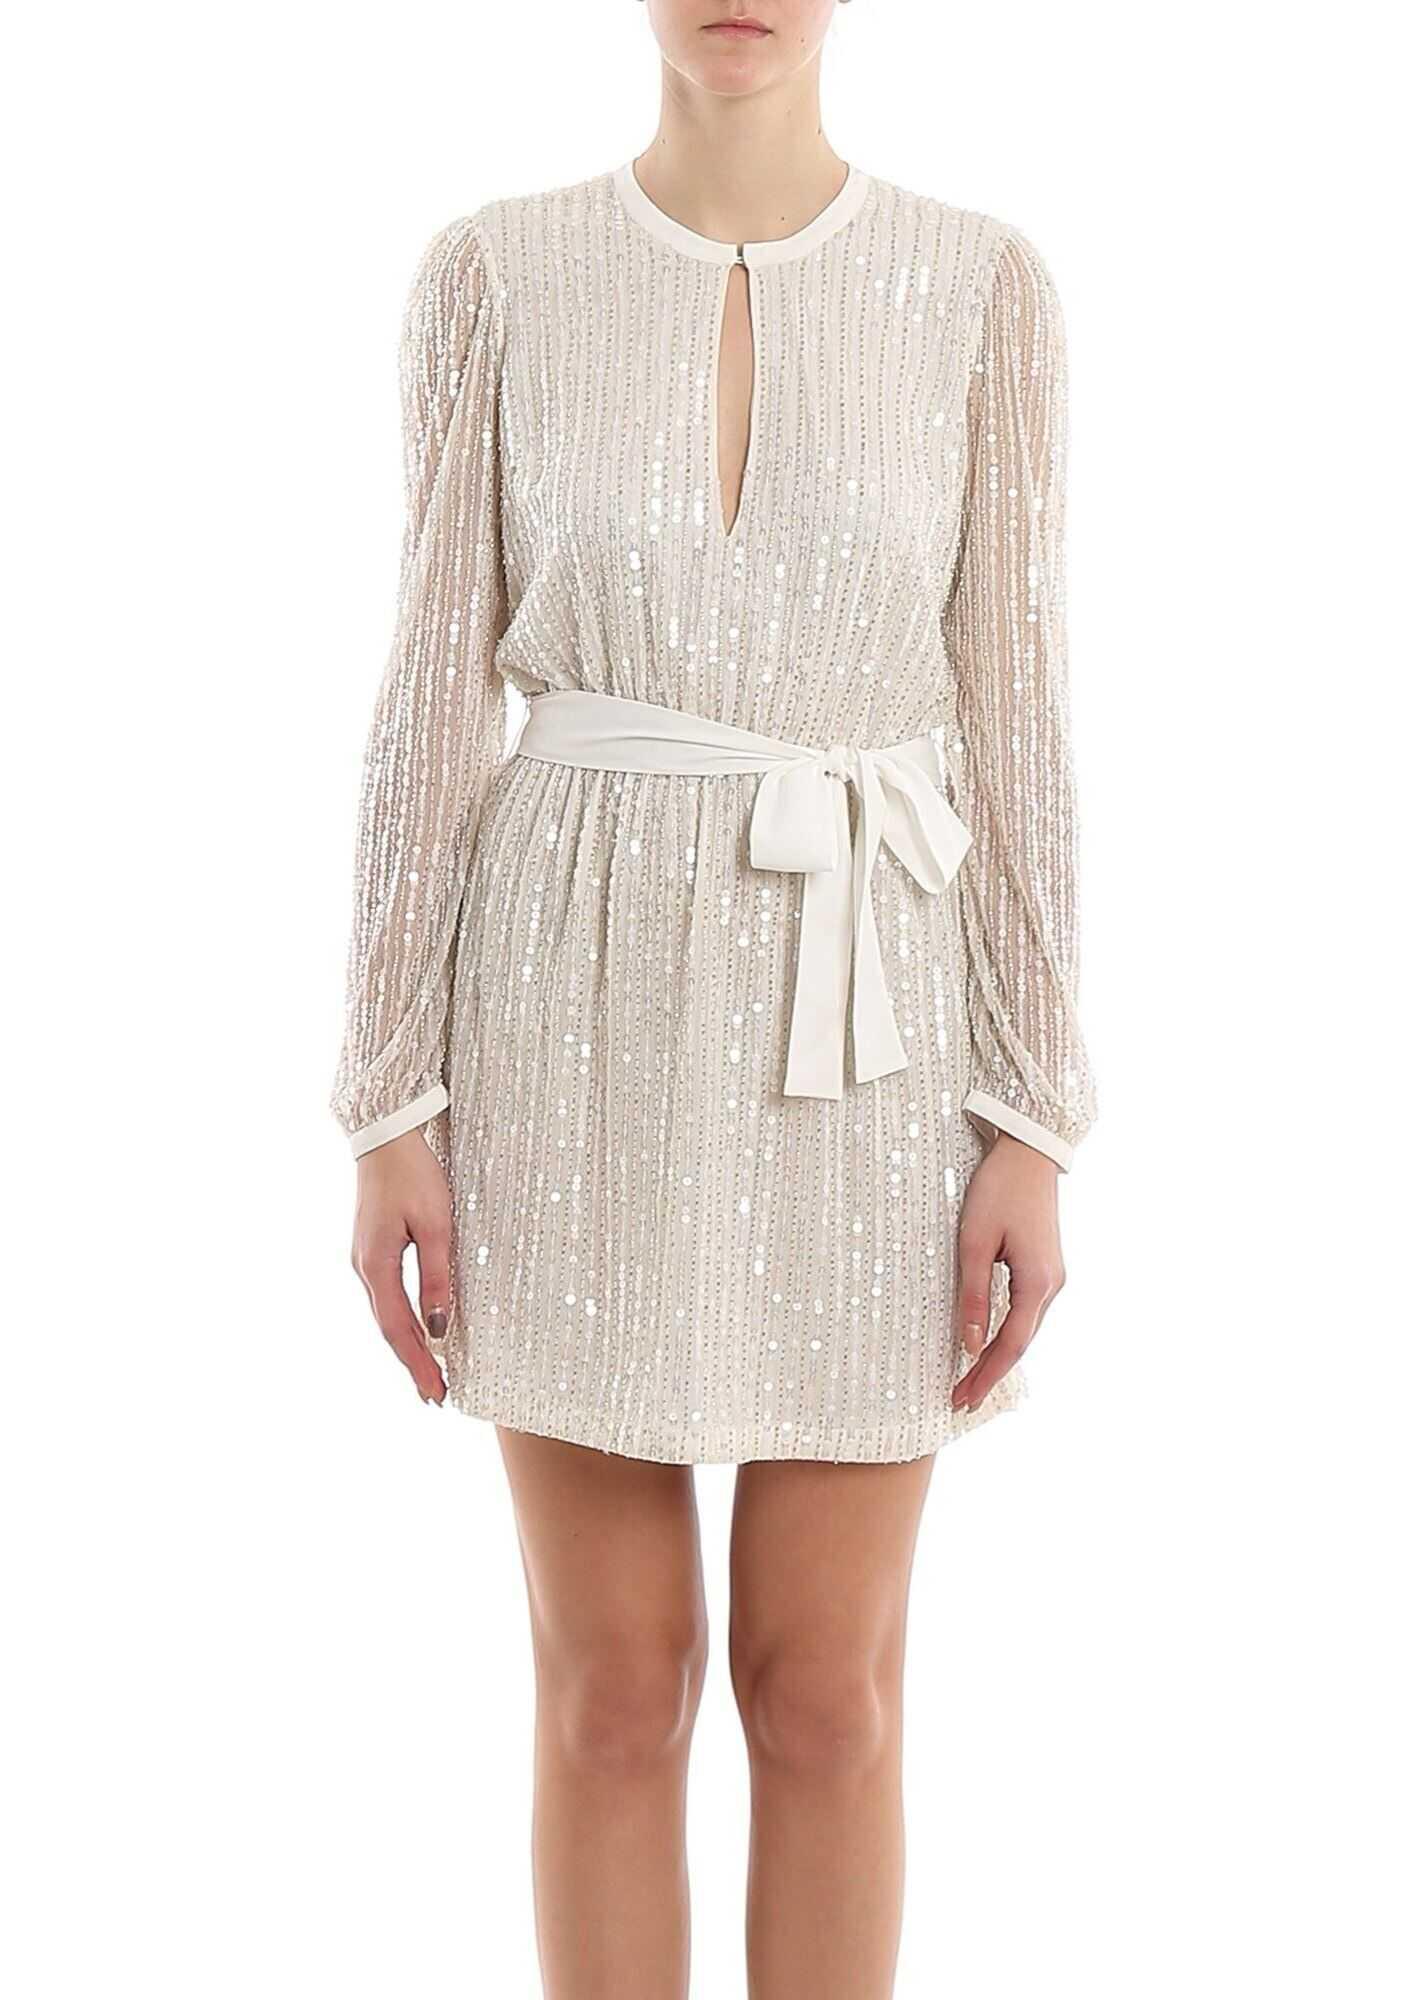 Twin-set Simona Barbieri Embellished Short Dress Cream